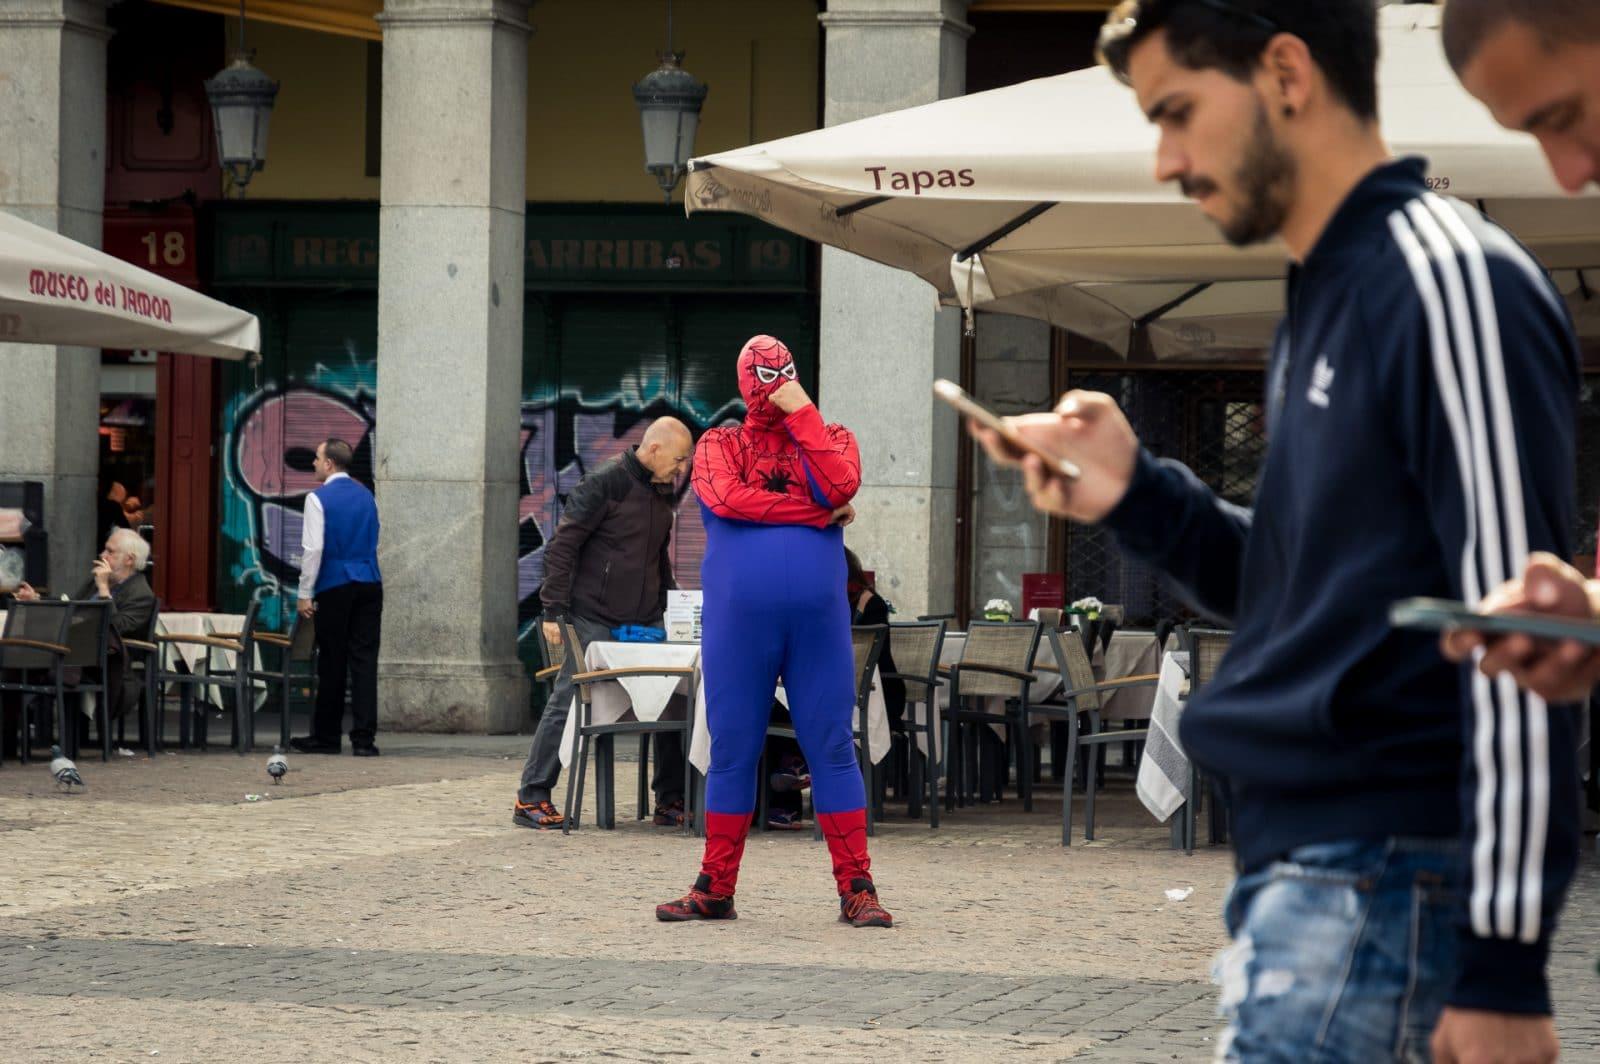 Los Madrileños a fat guy dressed as spiderman